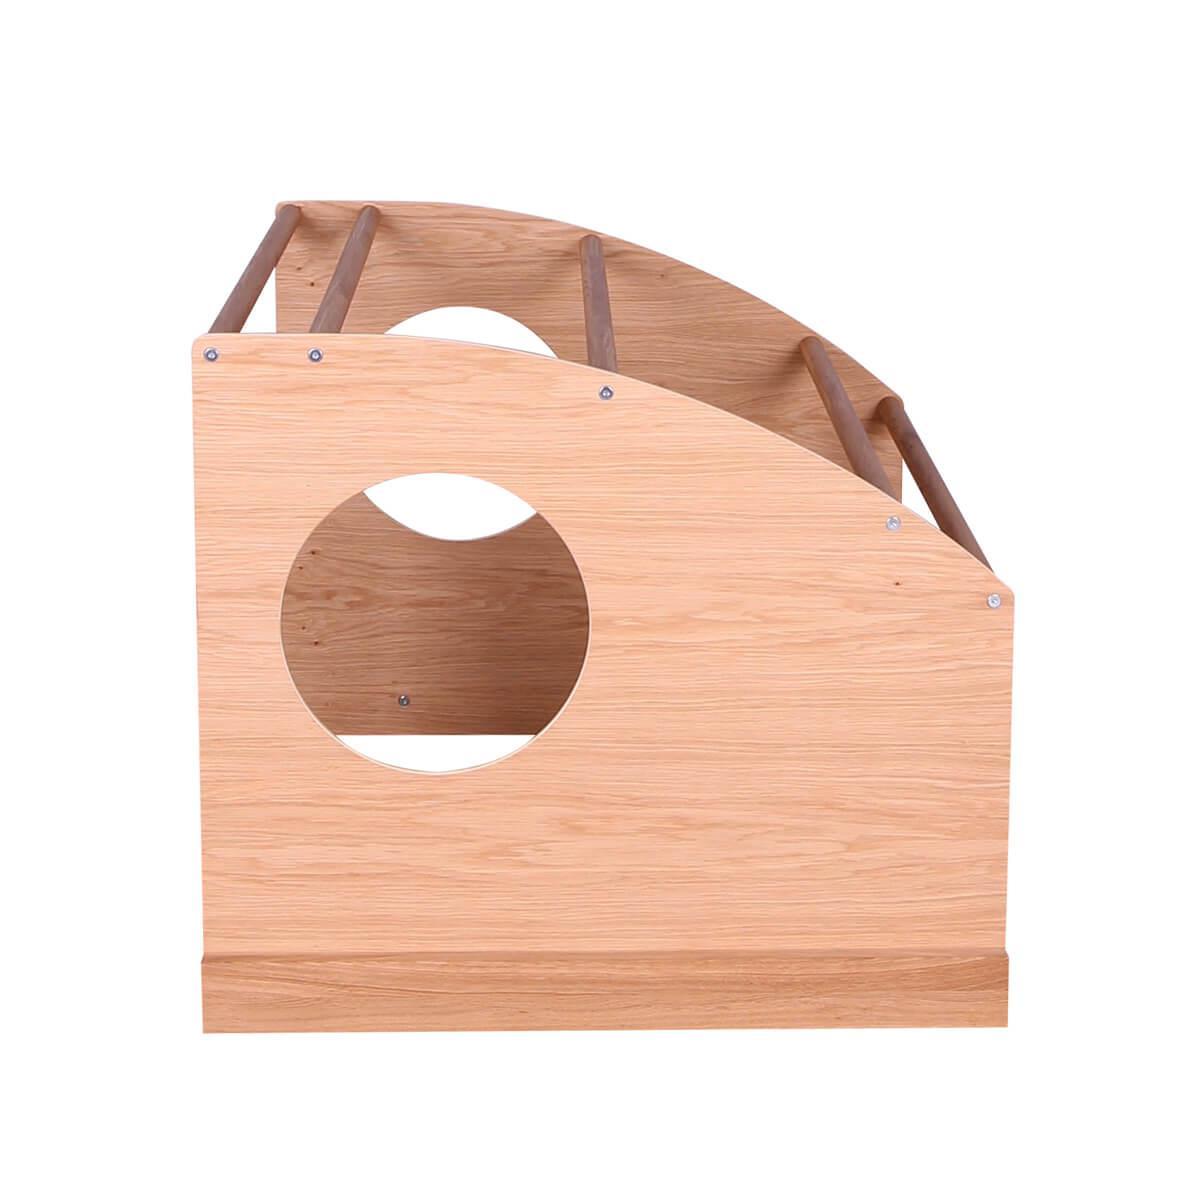 Cabaña juegos cama KASVA multiplex chapa roble